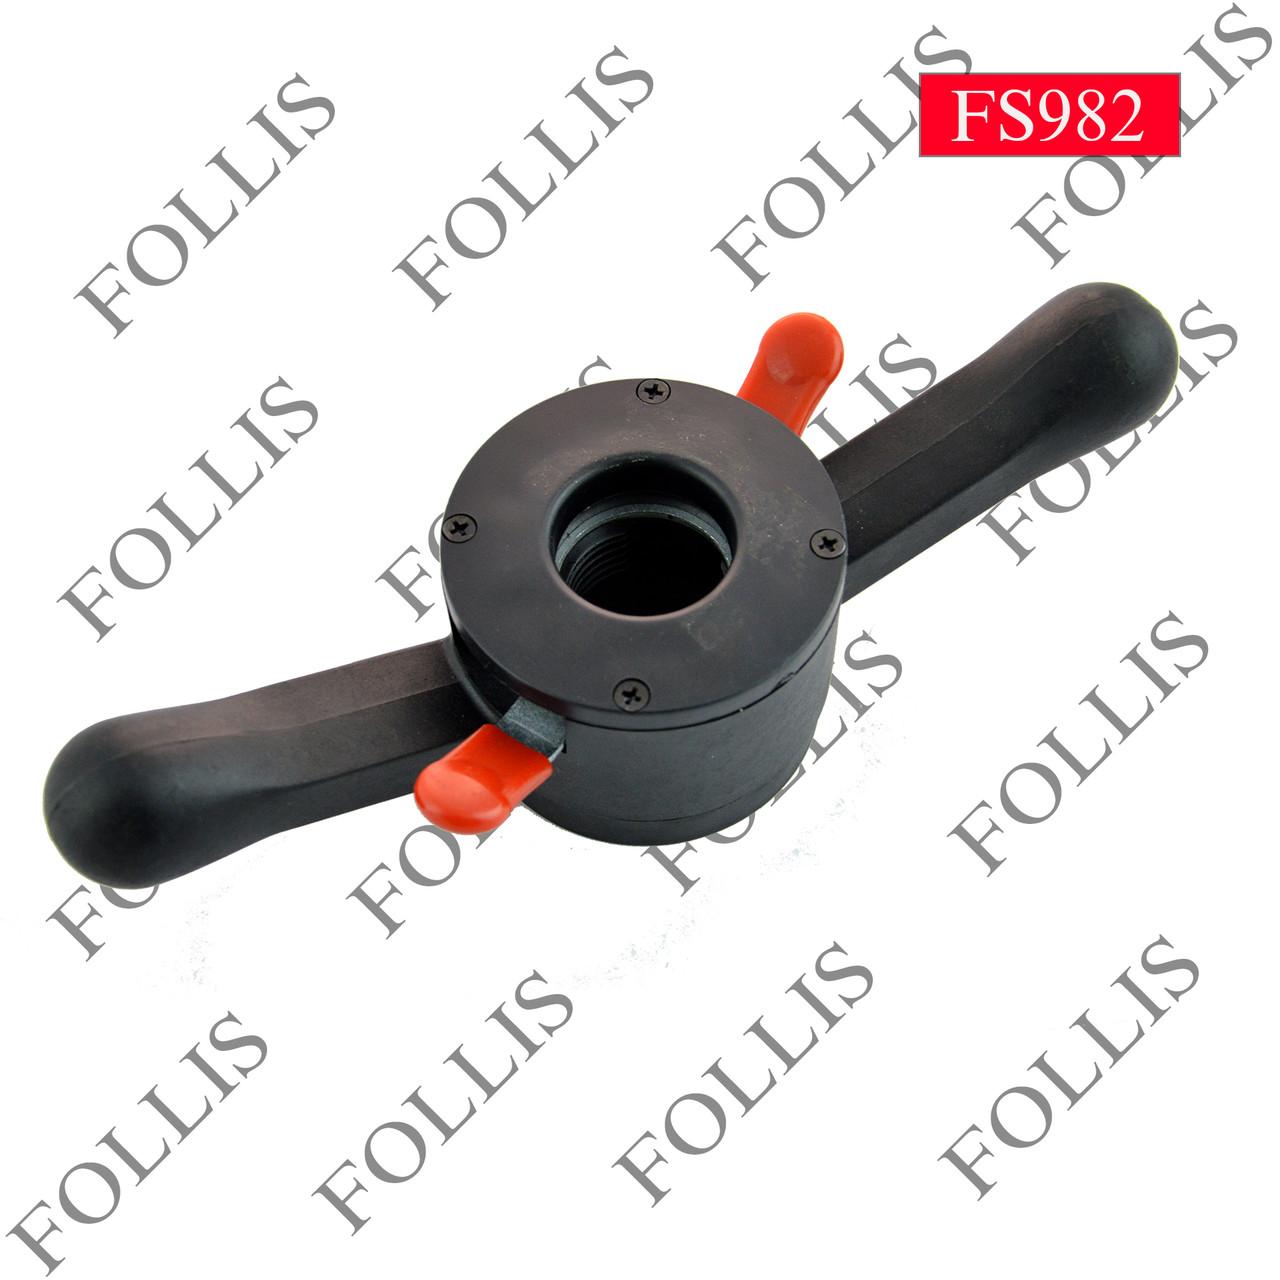 Ключ для балансировки LK-55 36*3T